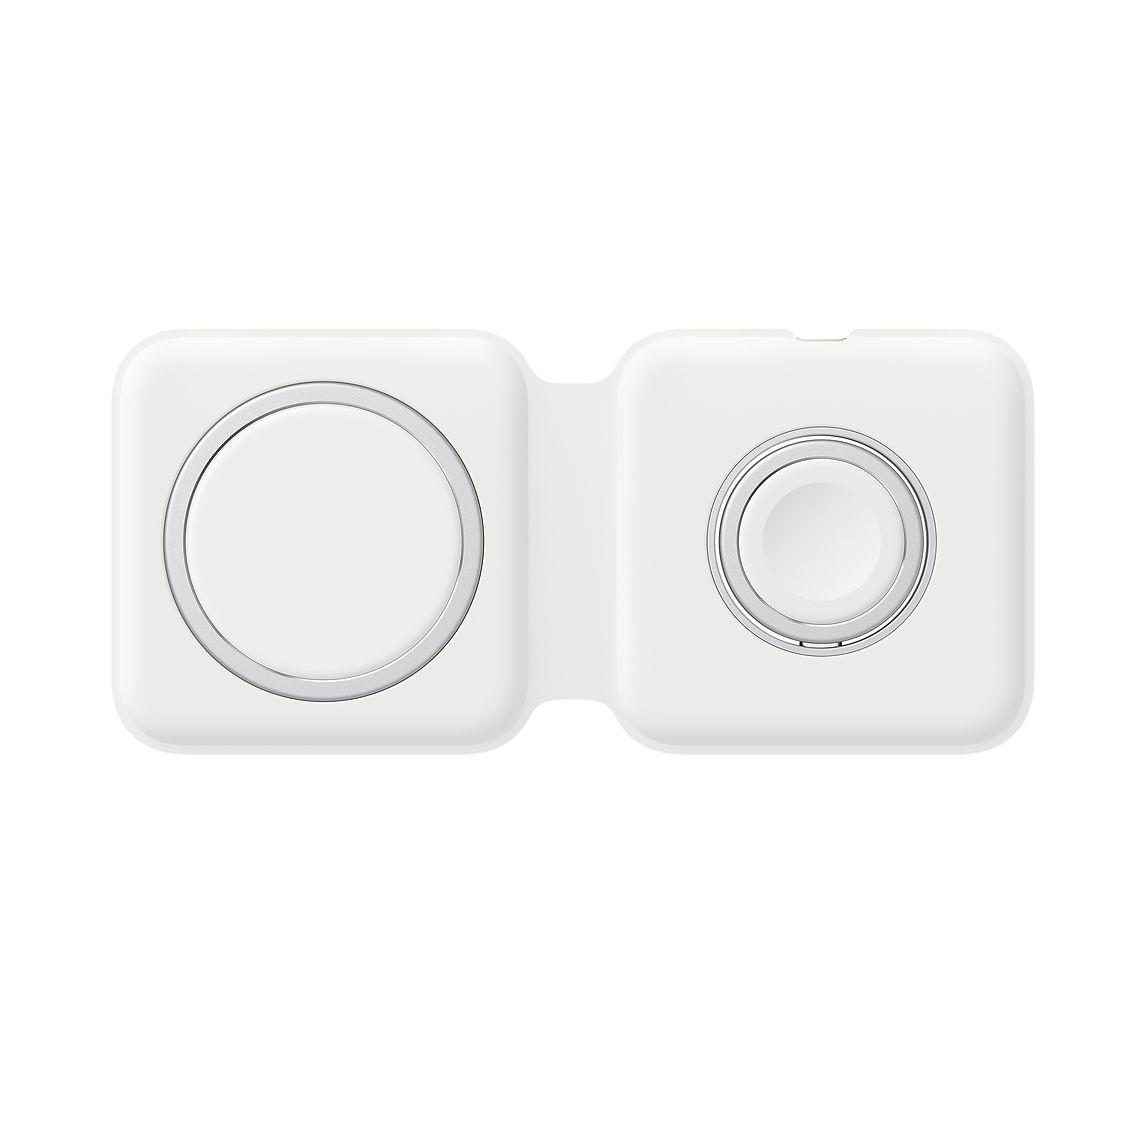 Apple 정품 MagSafe Duo 충전기, 혼합색상, 1개